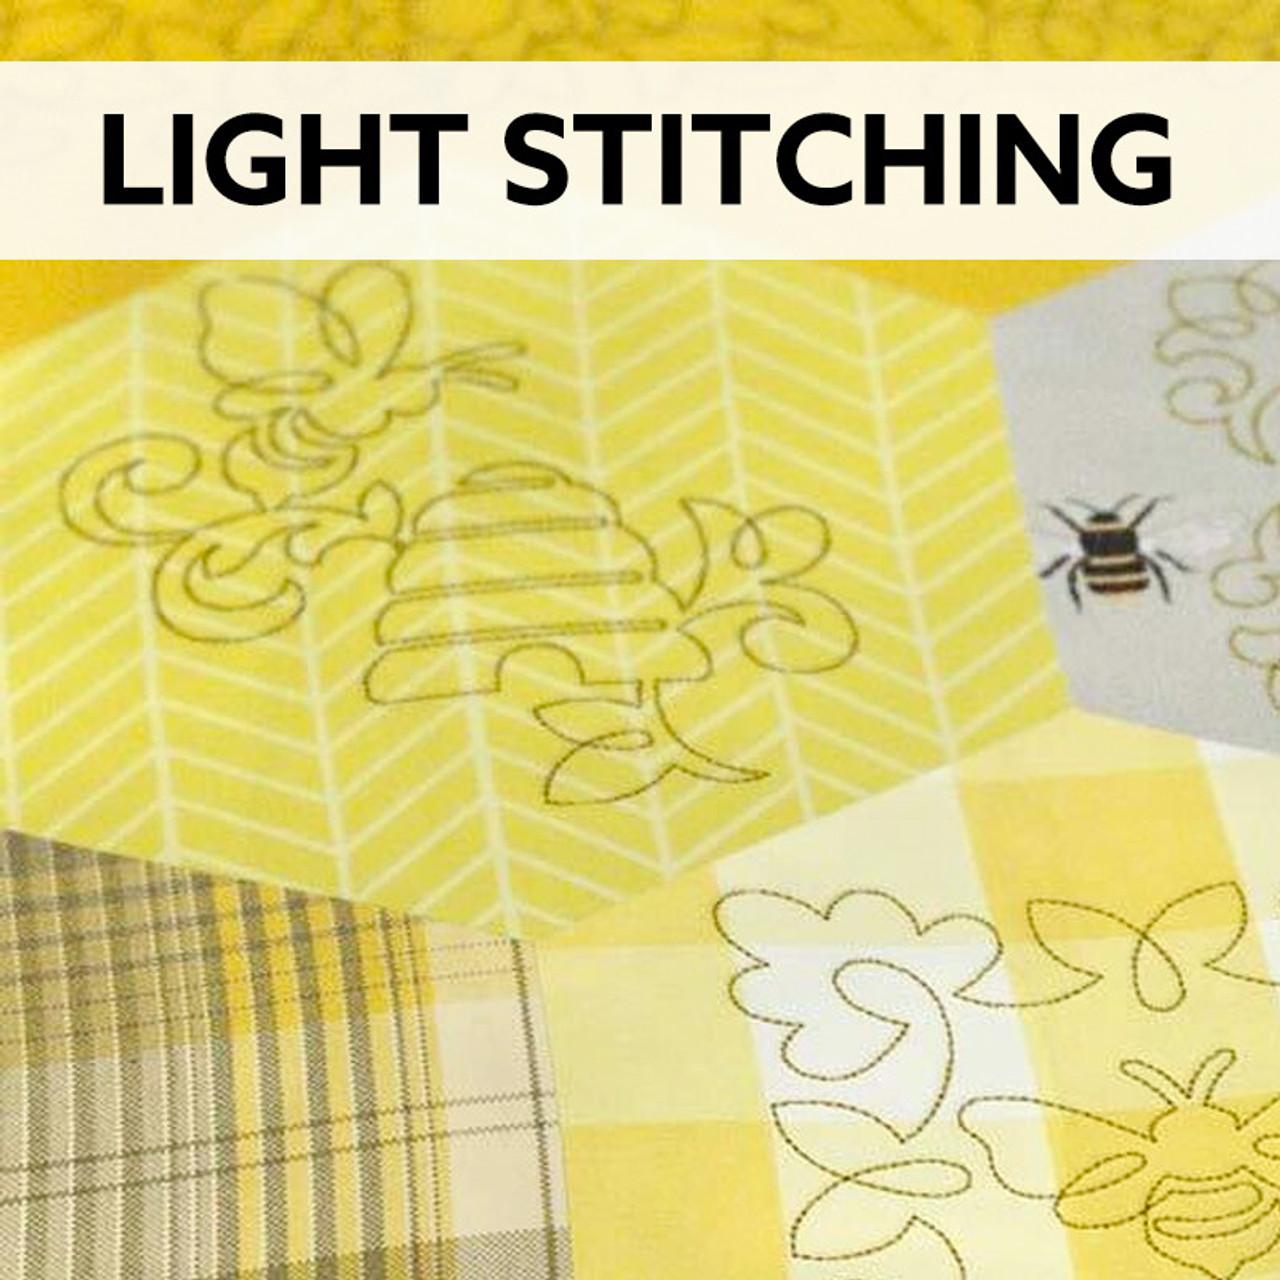 Light Stitching